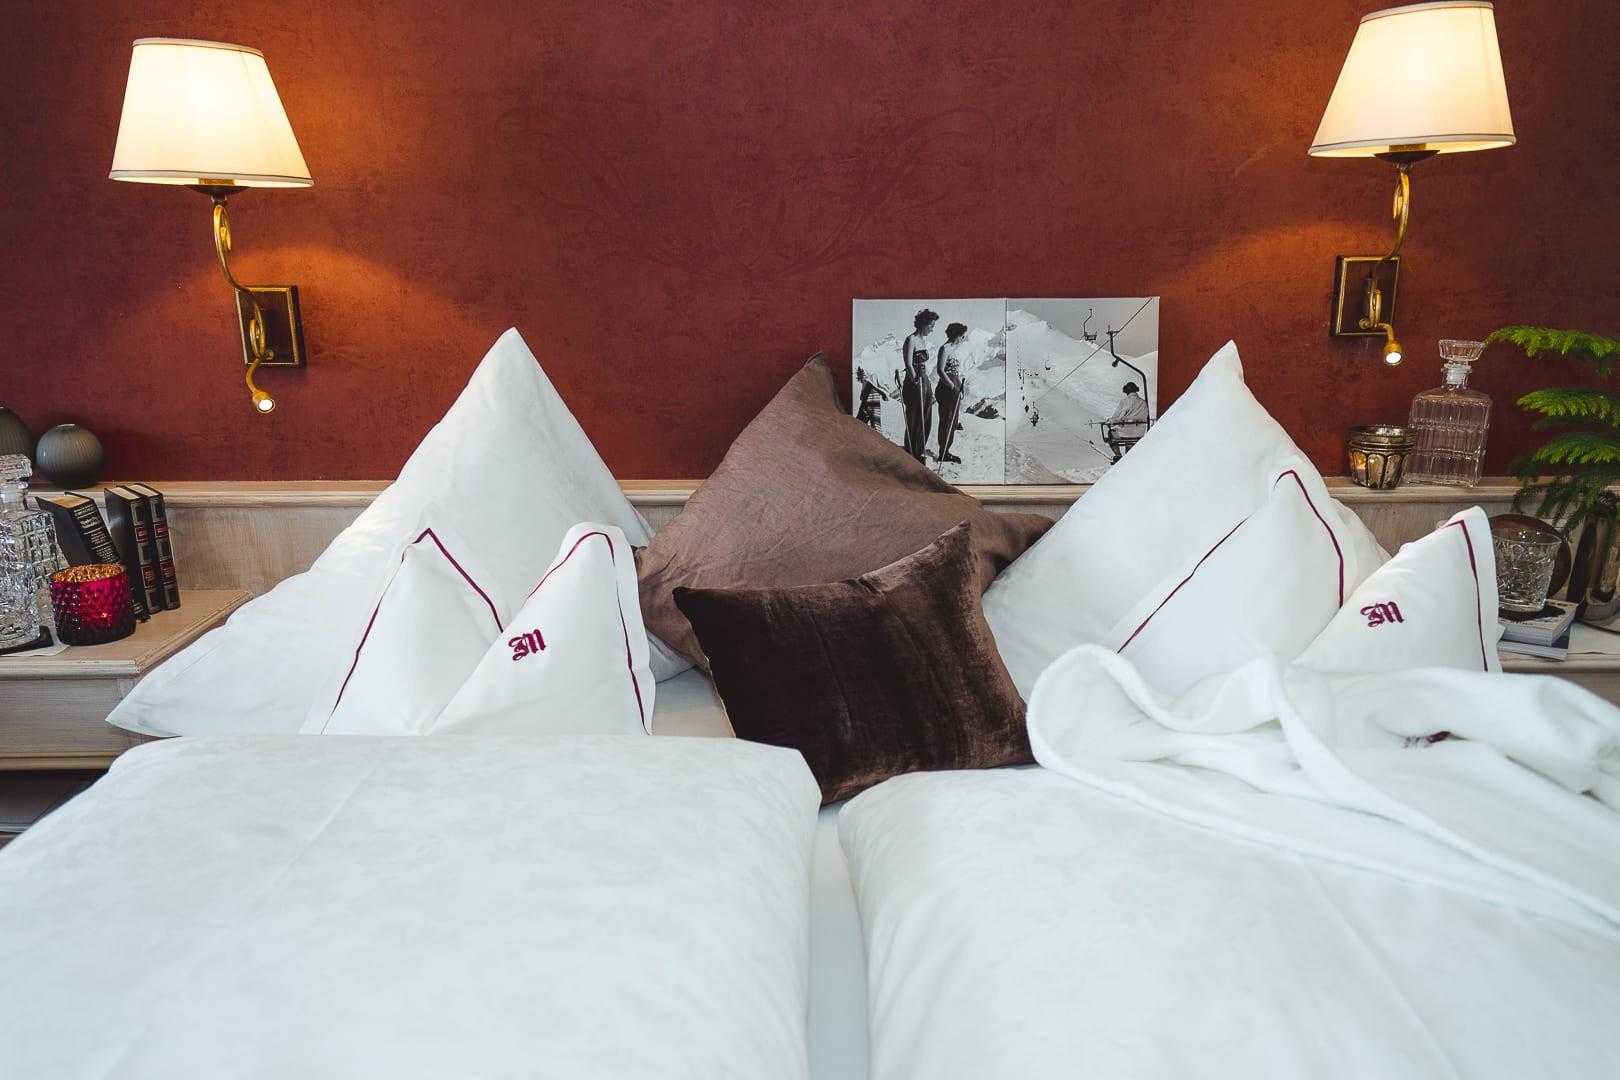 Doppelbett im Zimmer Omesberg im Hotel in Lech am Arlberg.